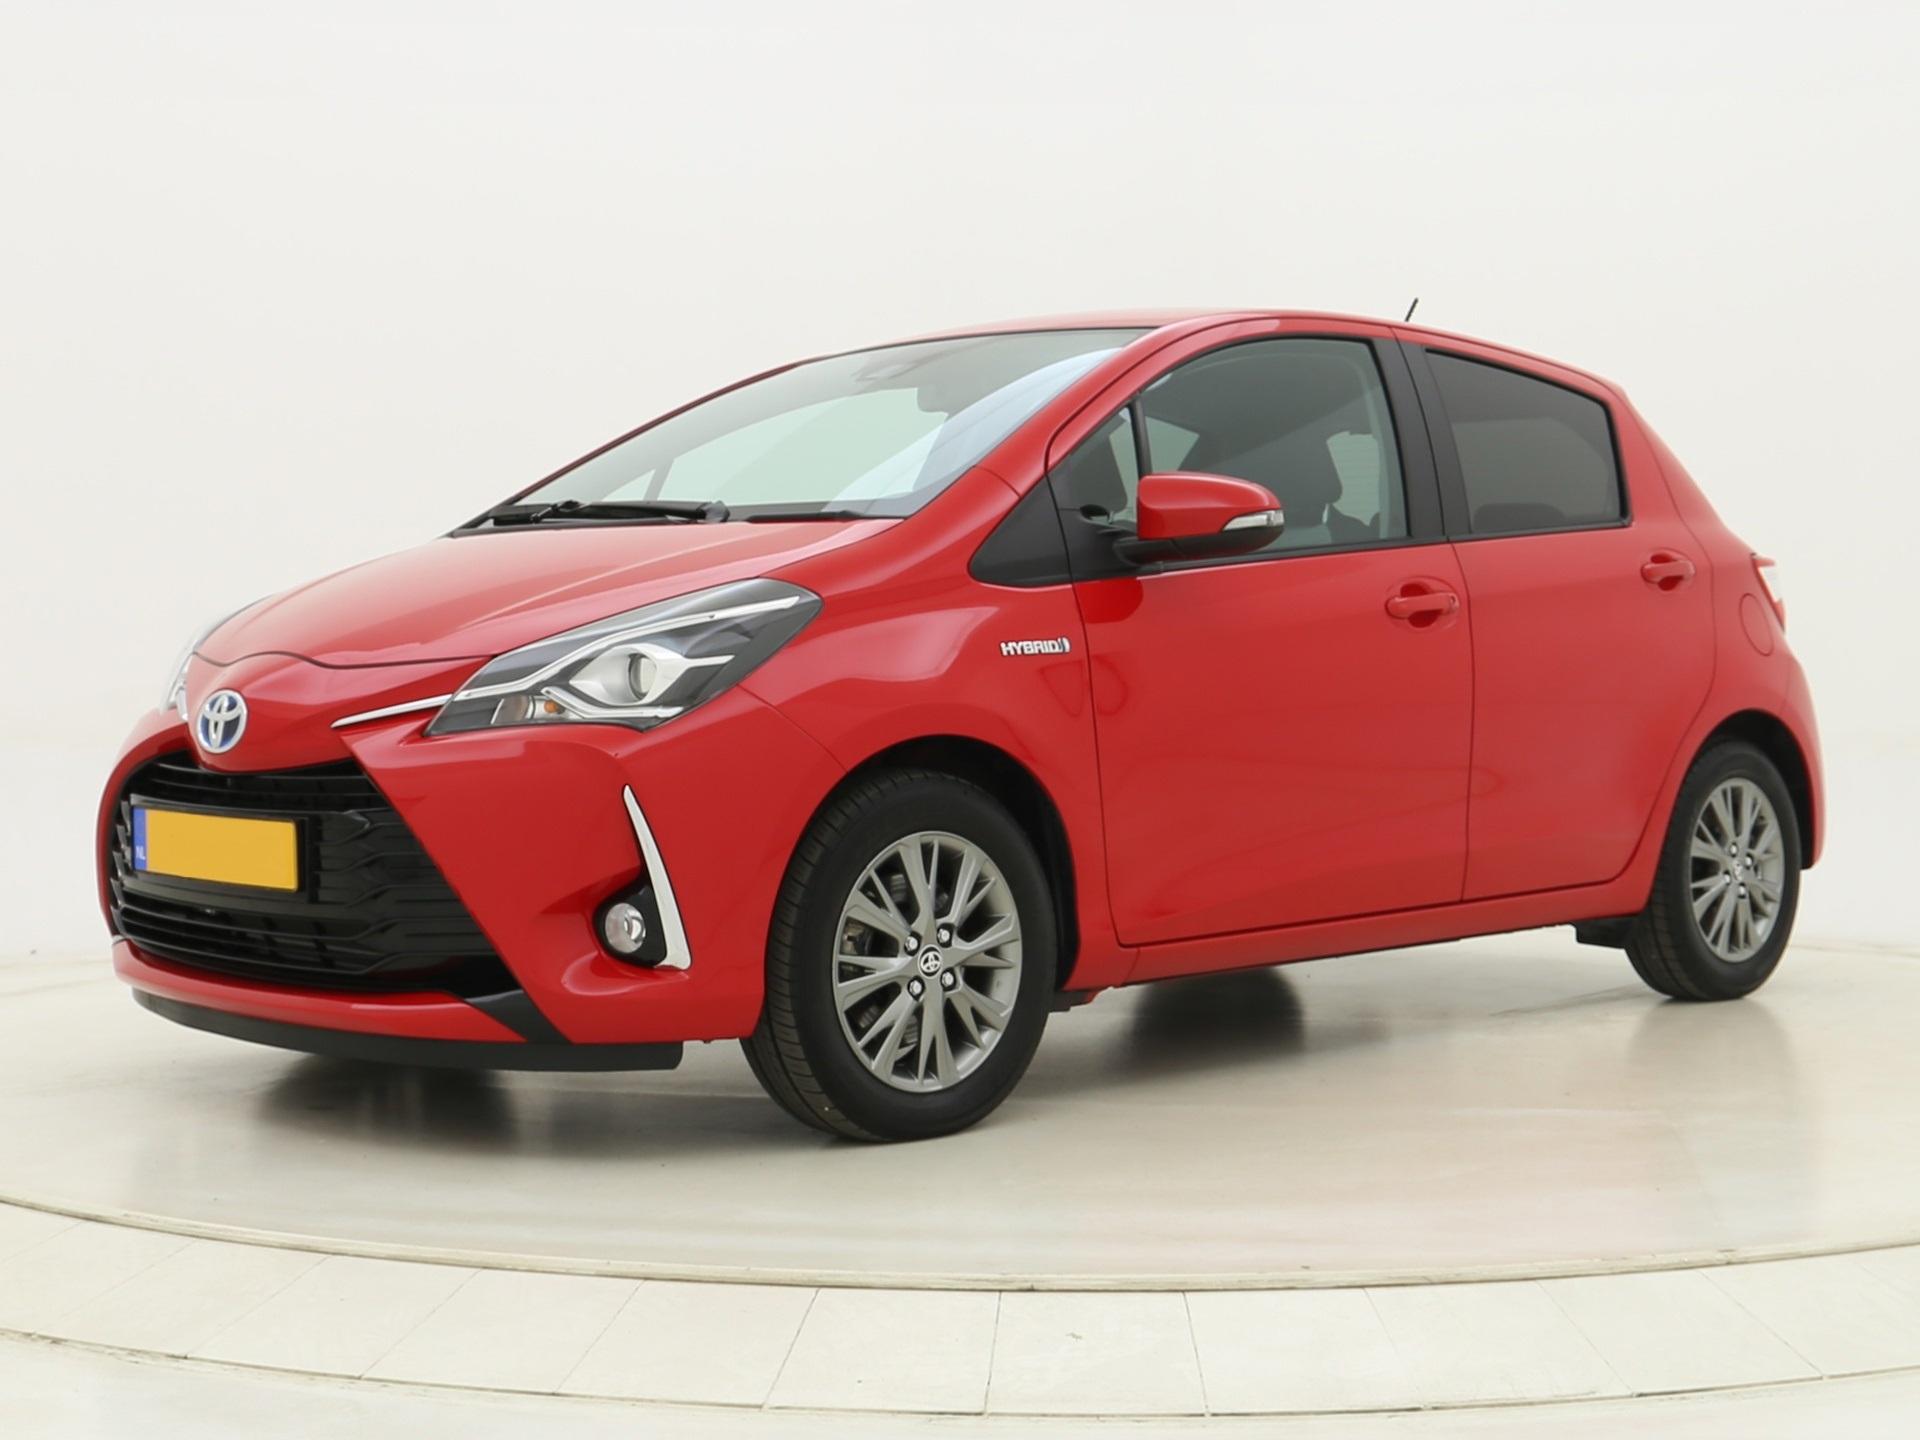 Toyota Yaris 1.5 Hybrid Dynamic Automaat